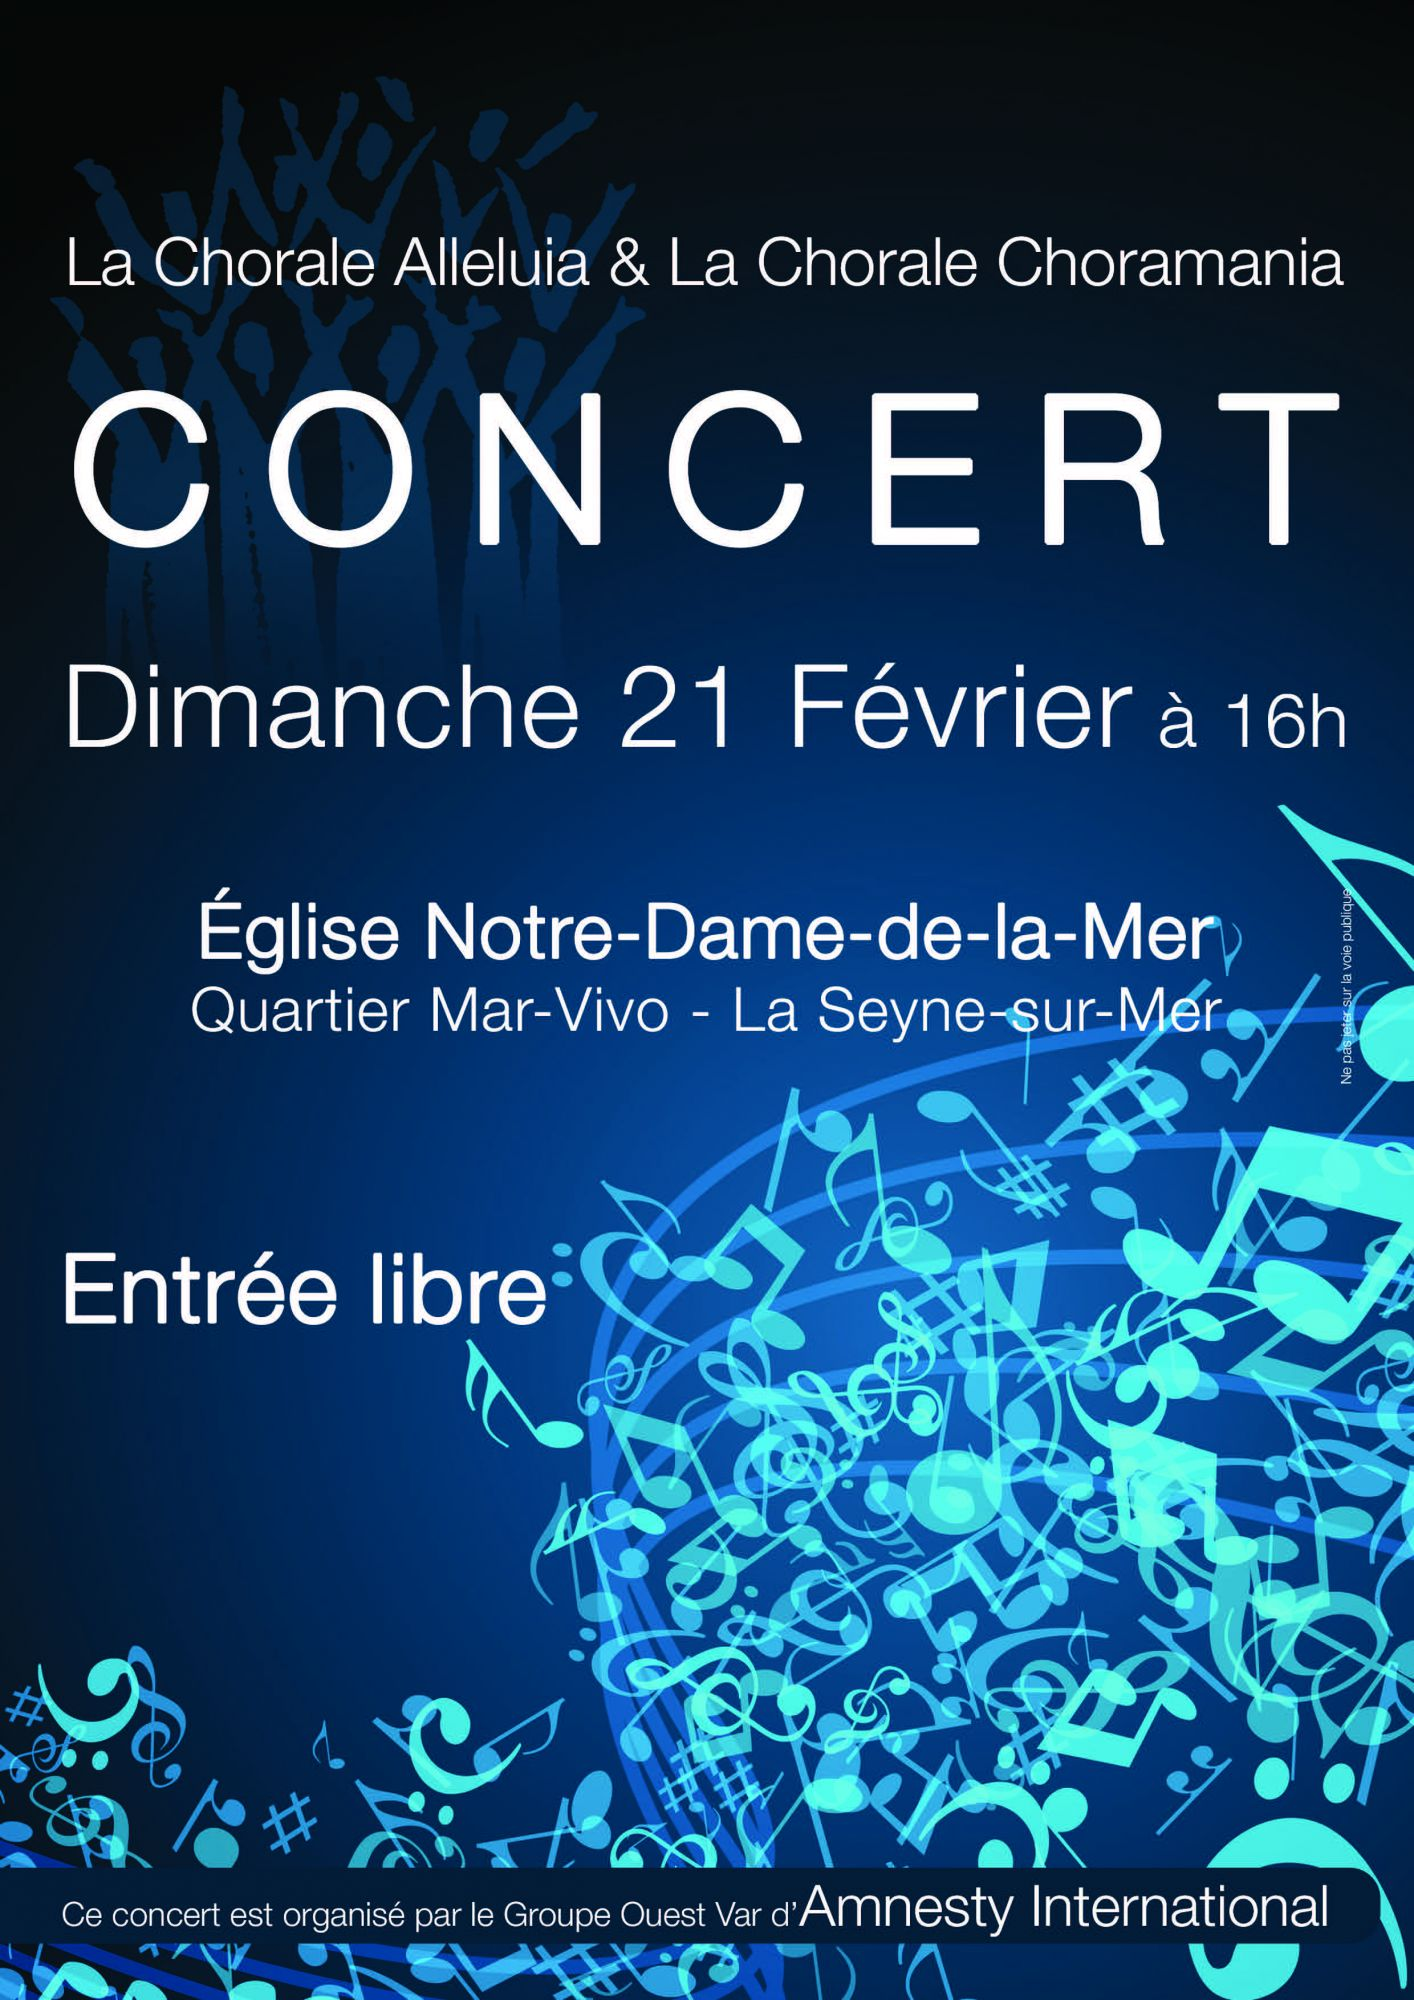 Affiche Concert du 21 février 2016